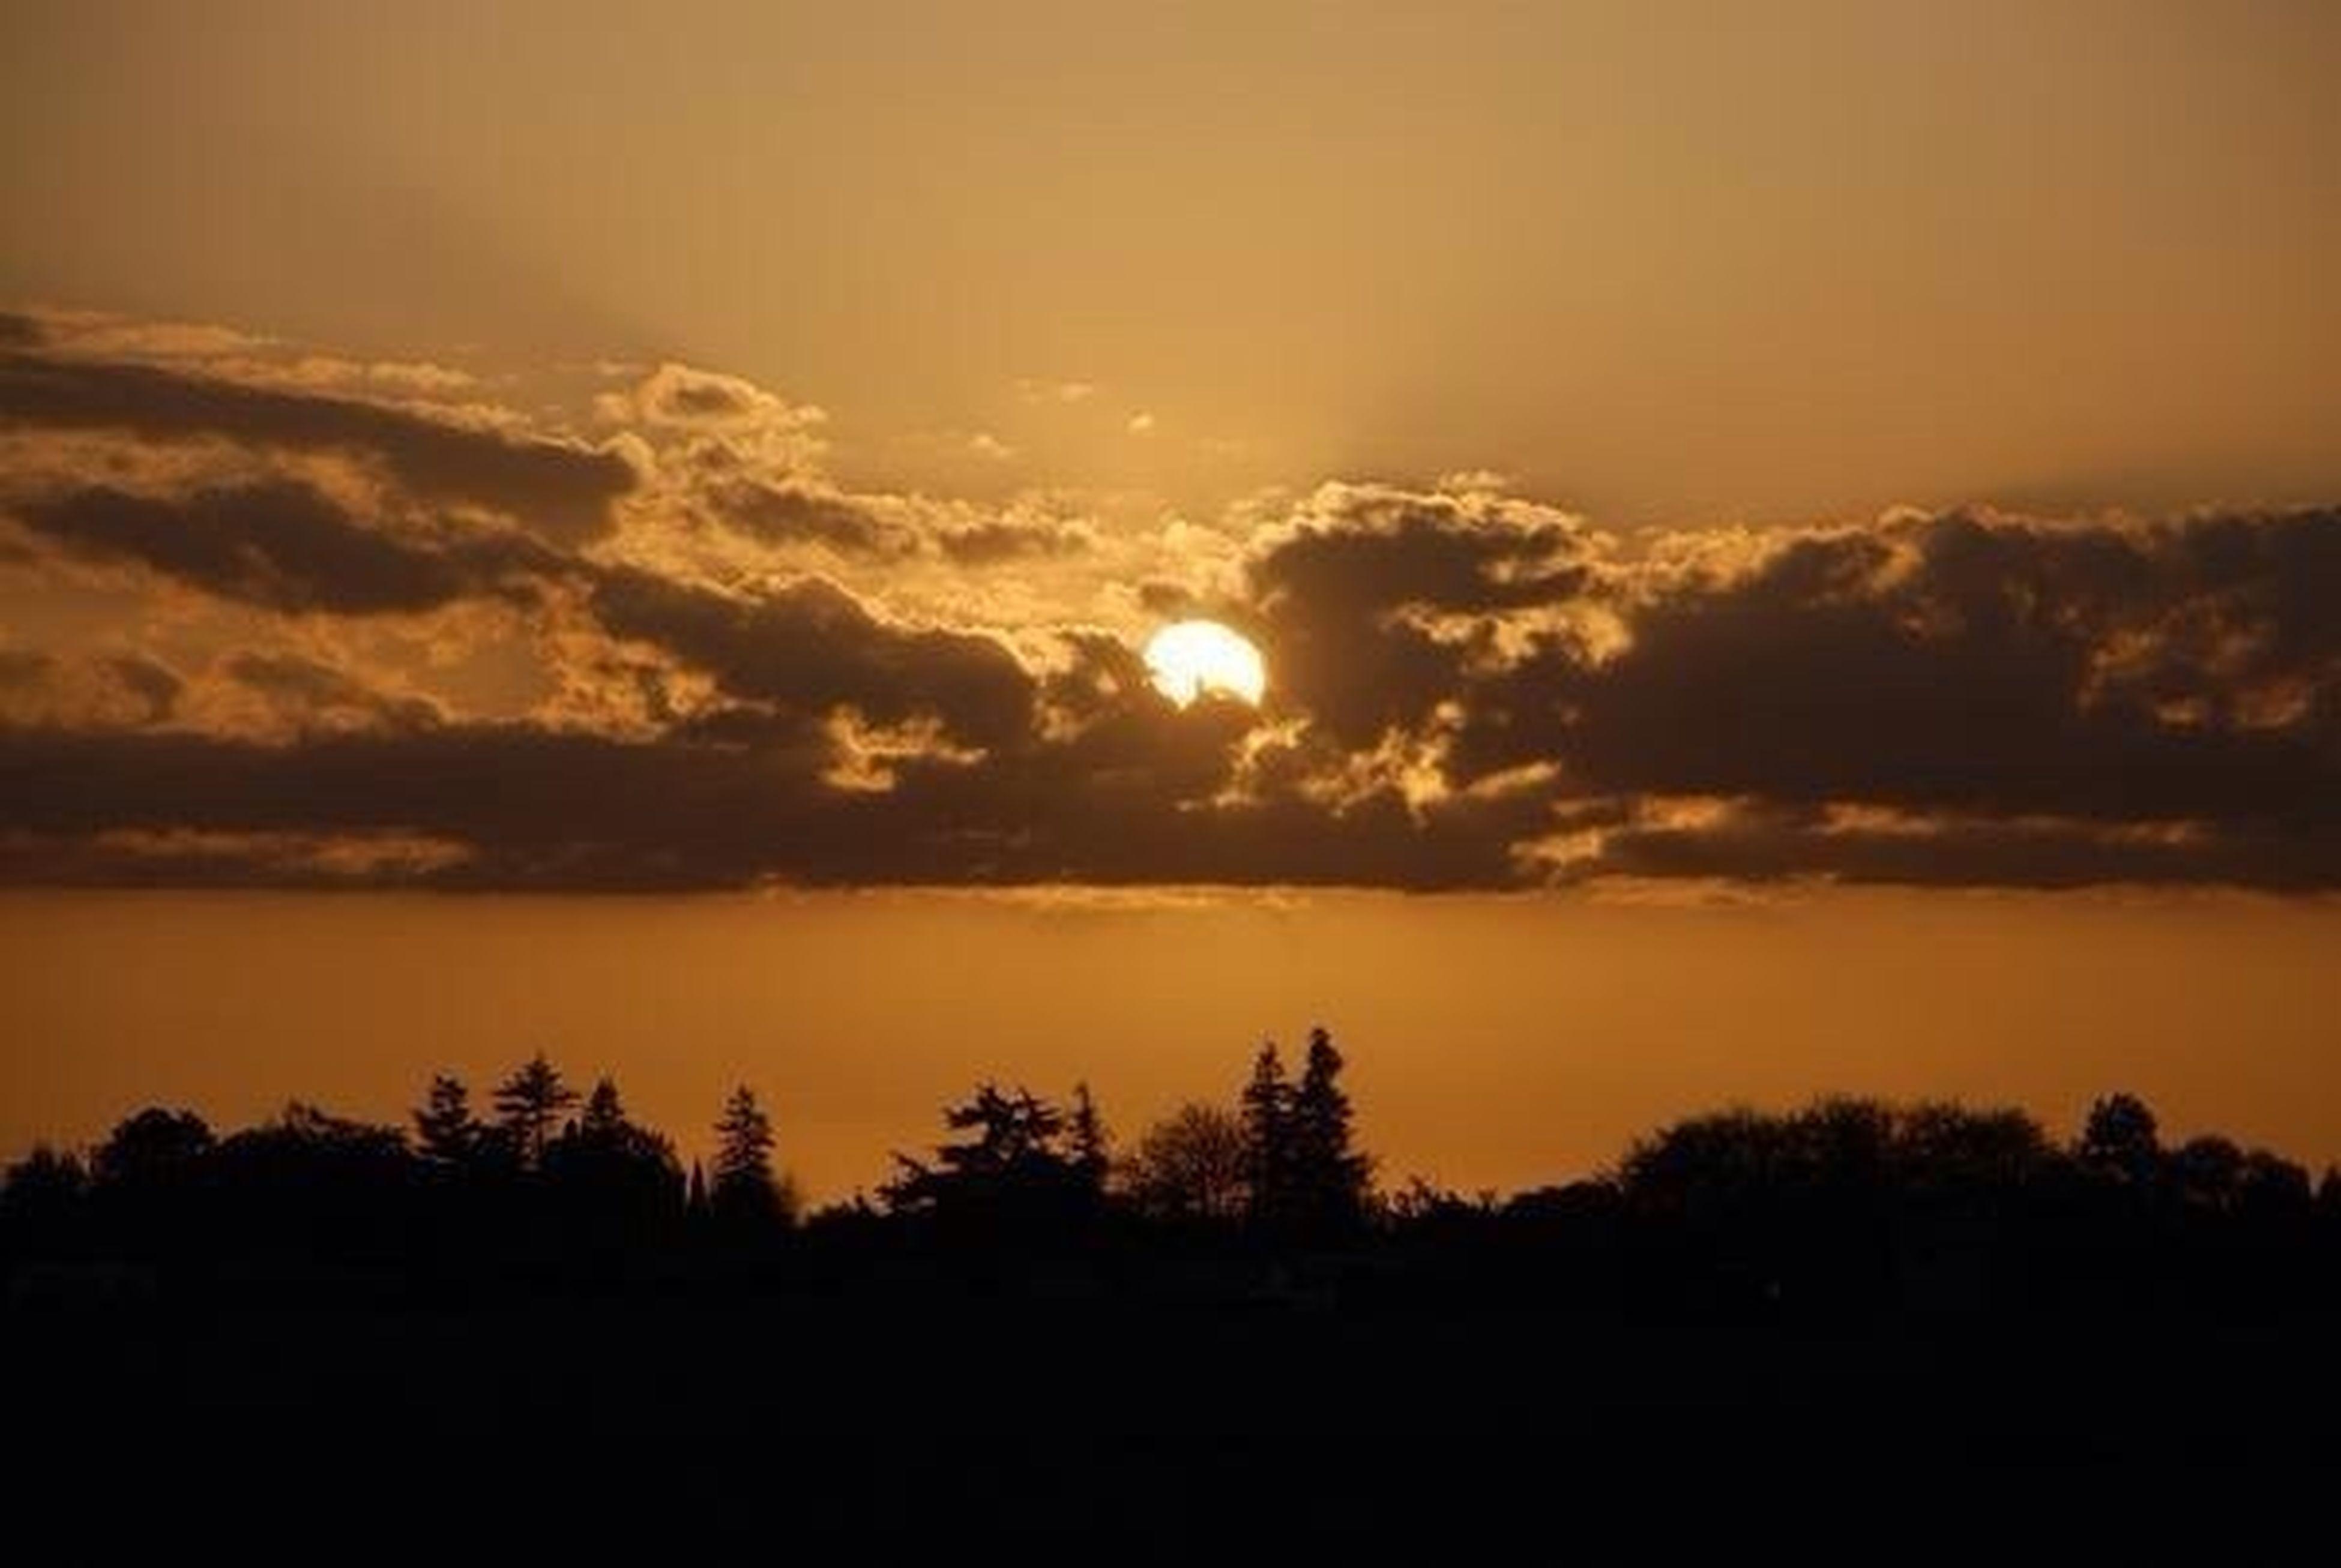 sunset, scenics, silhouette, tranquil scene, beauty in nature, orange color, tranquility, sky, idyllic, nature, sun, cloud - sky, dramatic sky, landscape, majestic, tree, cloud, outdoors, no people, moody sky